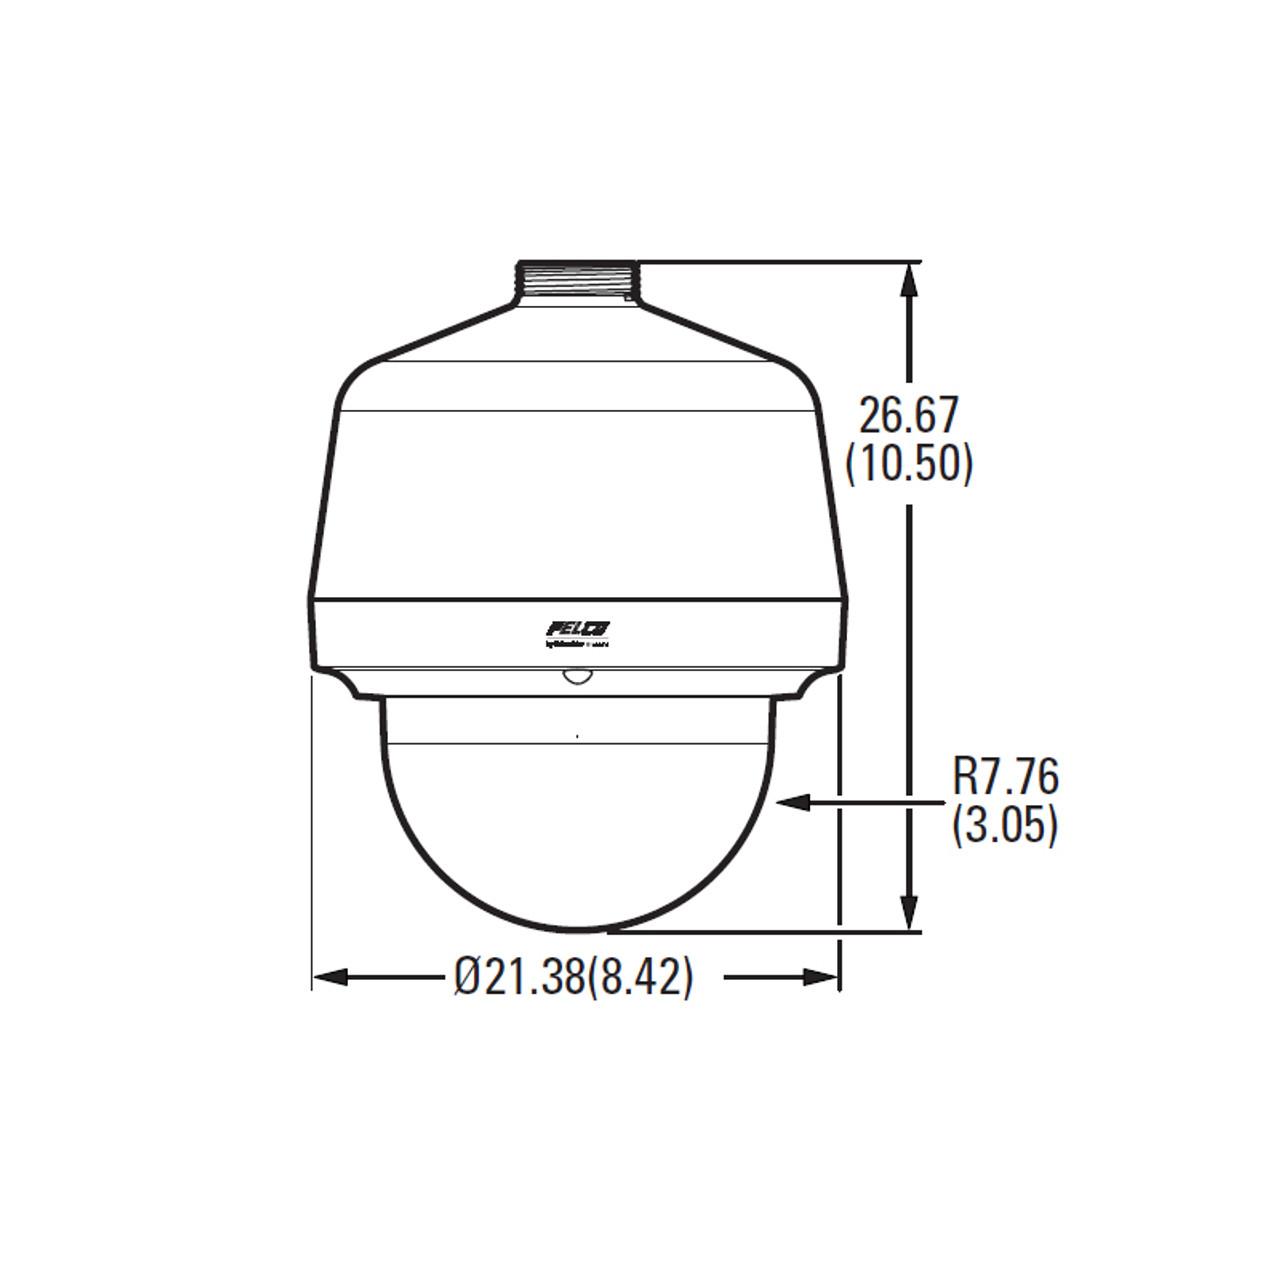 hight resolution of pelco ptz camera wiring diagram